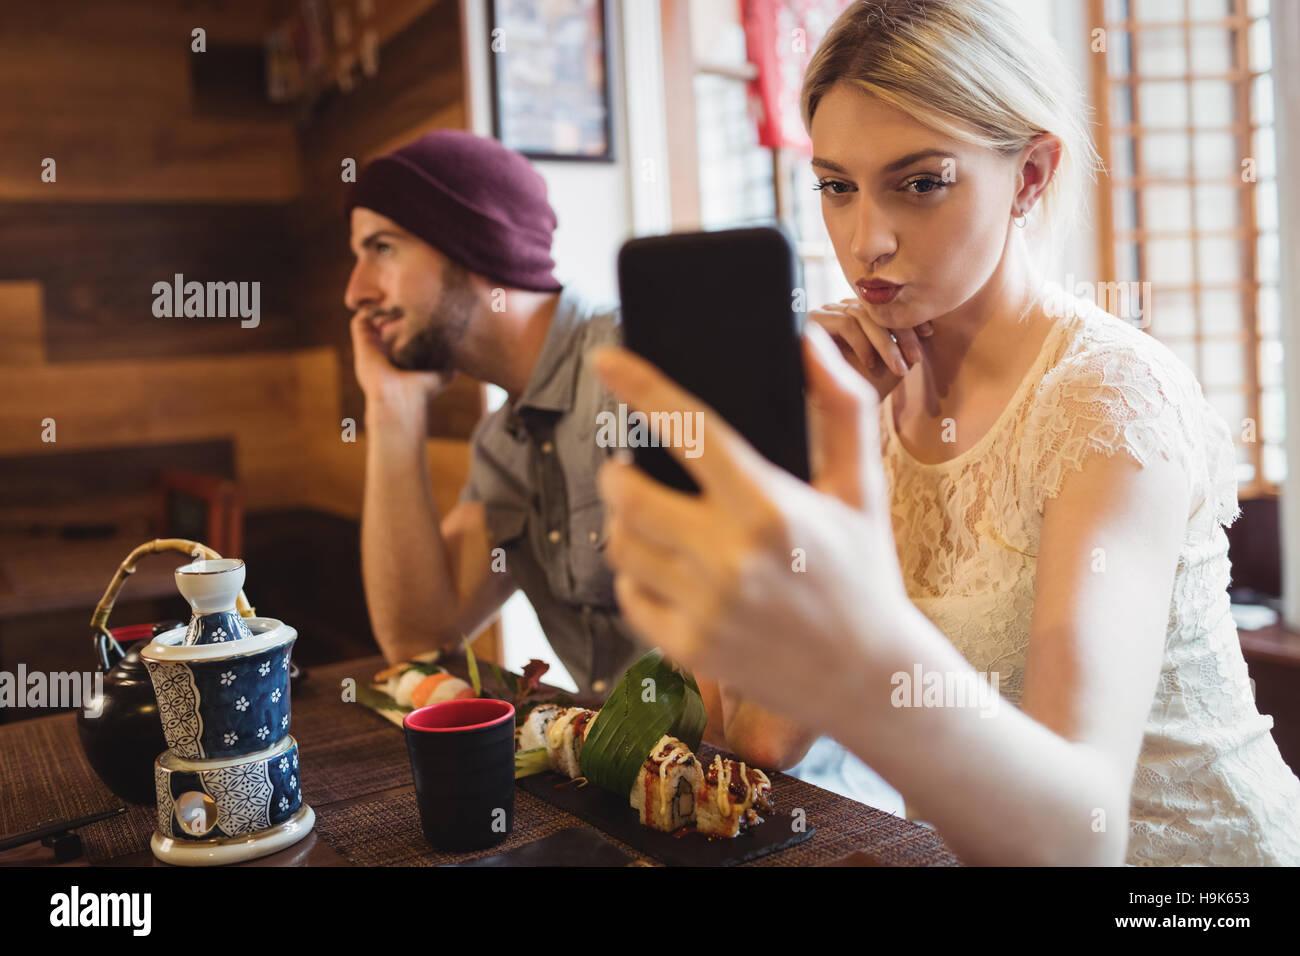 Woman taking selfie while man talking on phone Stock Photo